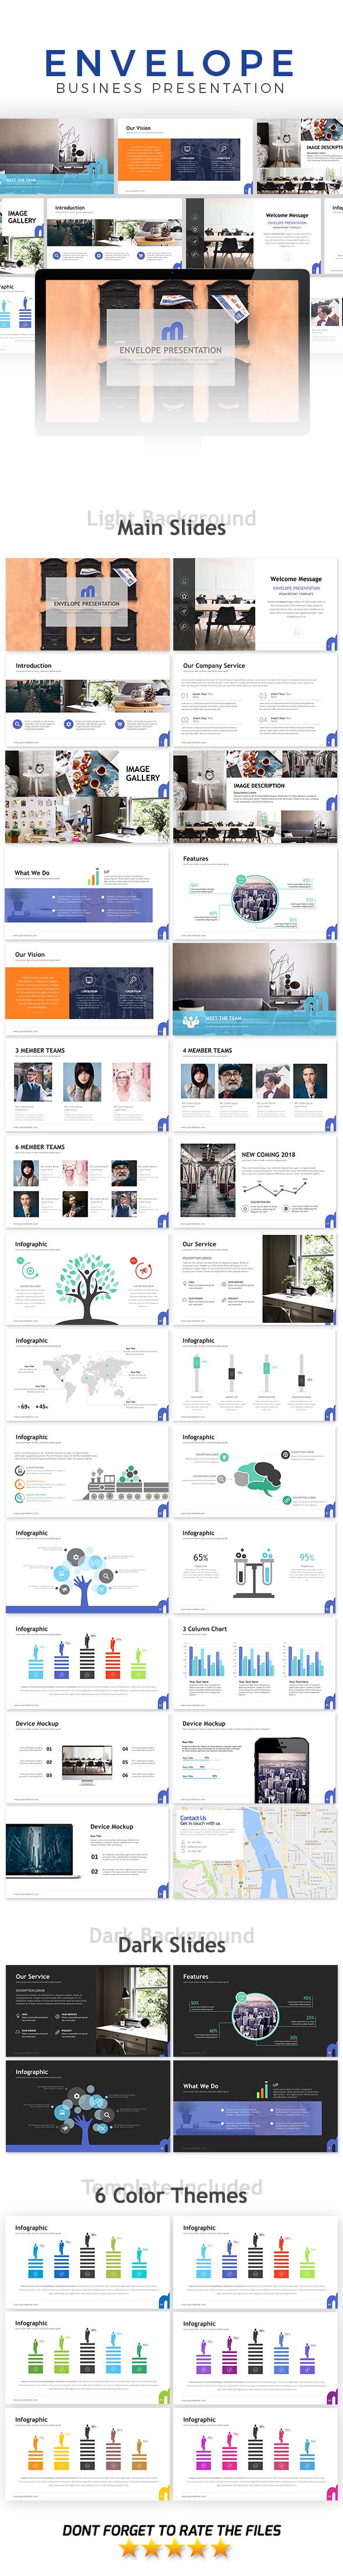 Envelope Presentation Template - Business PowerPoint Templates